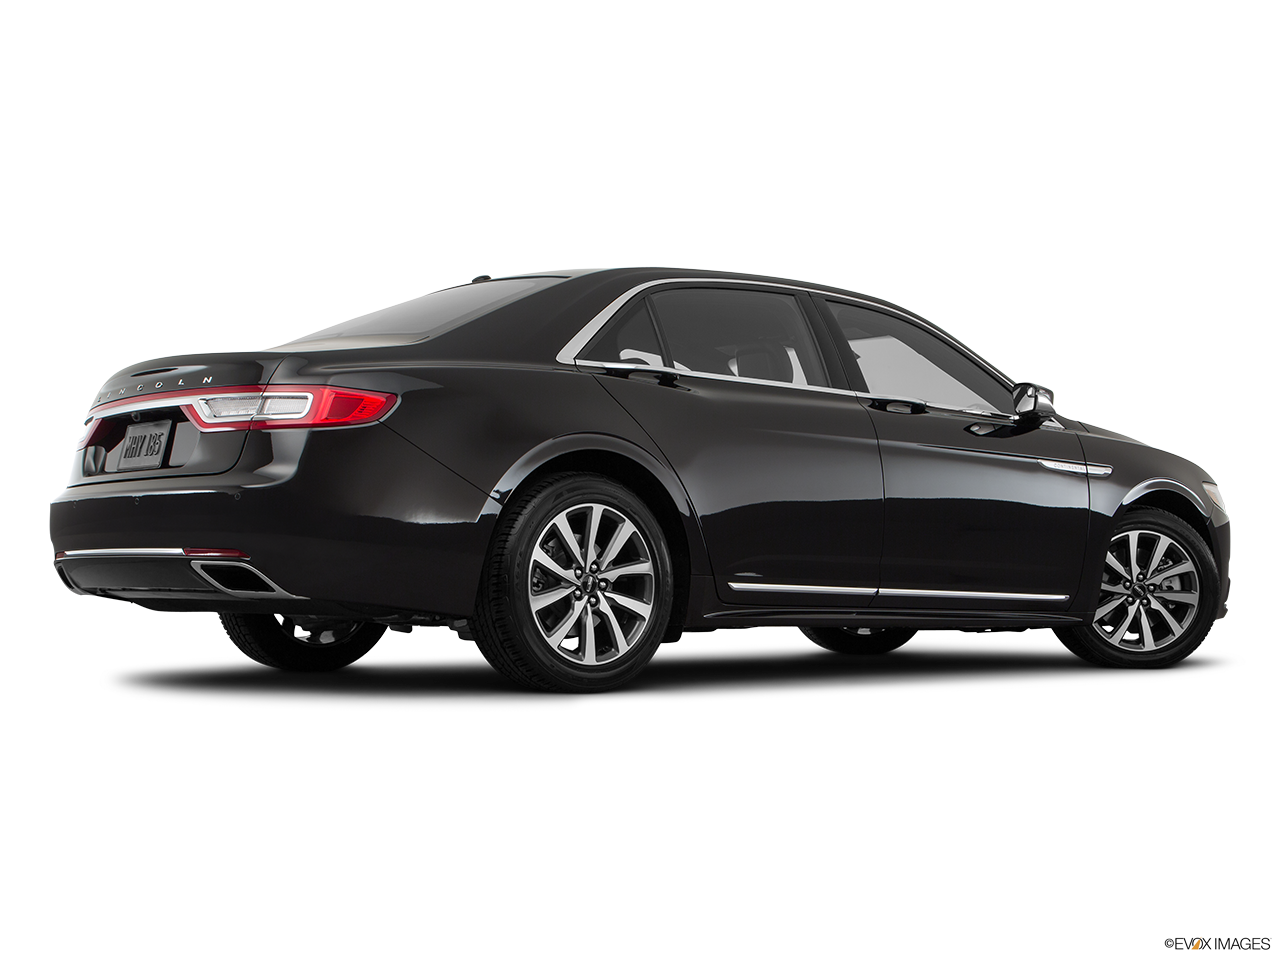 2020 Lincoln Continental photo